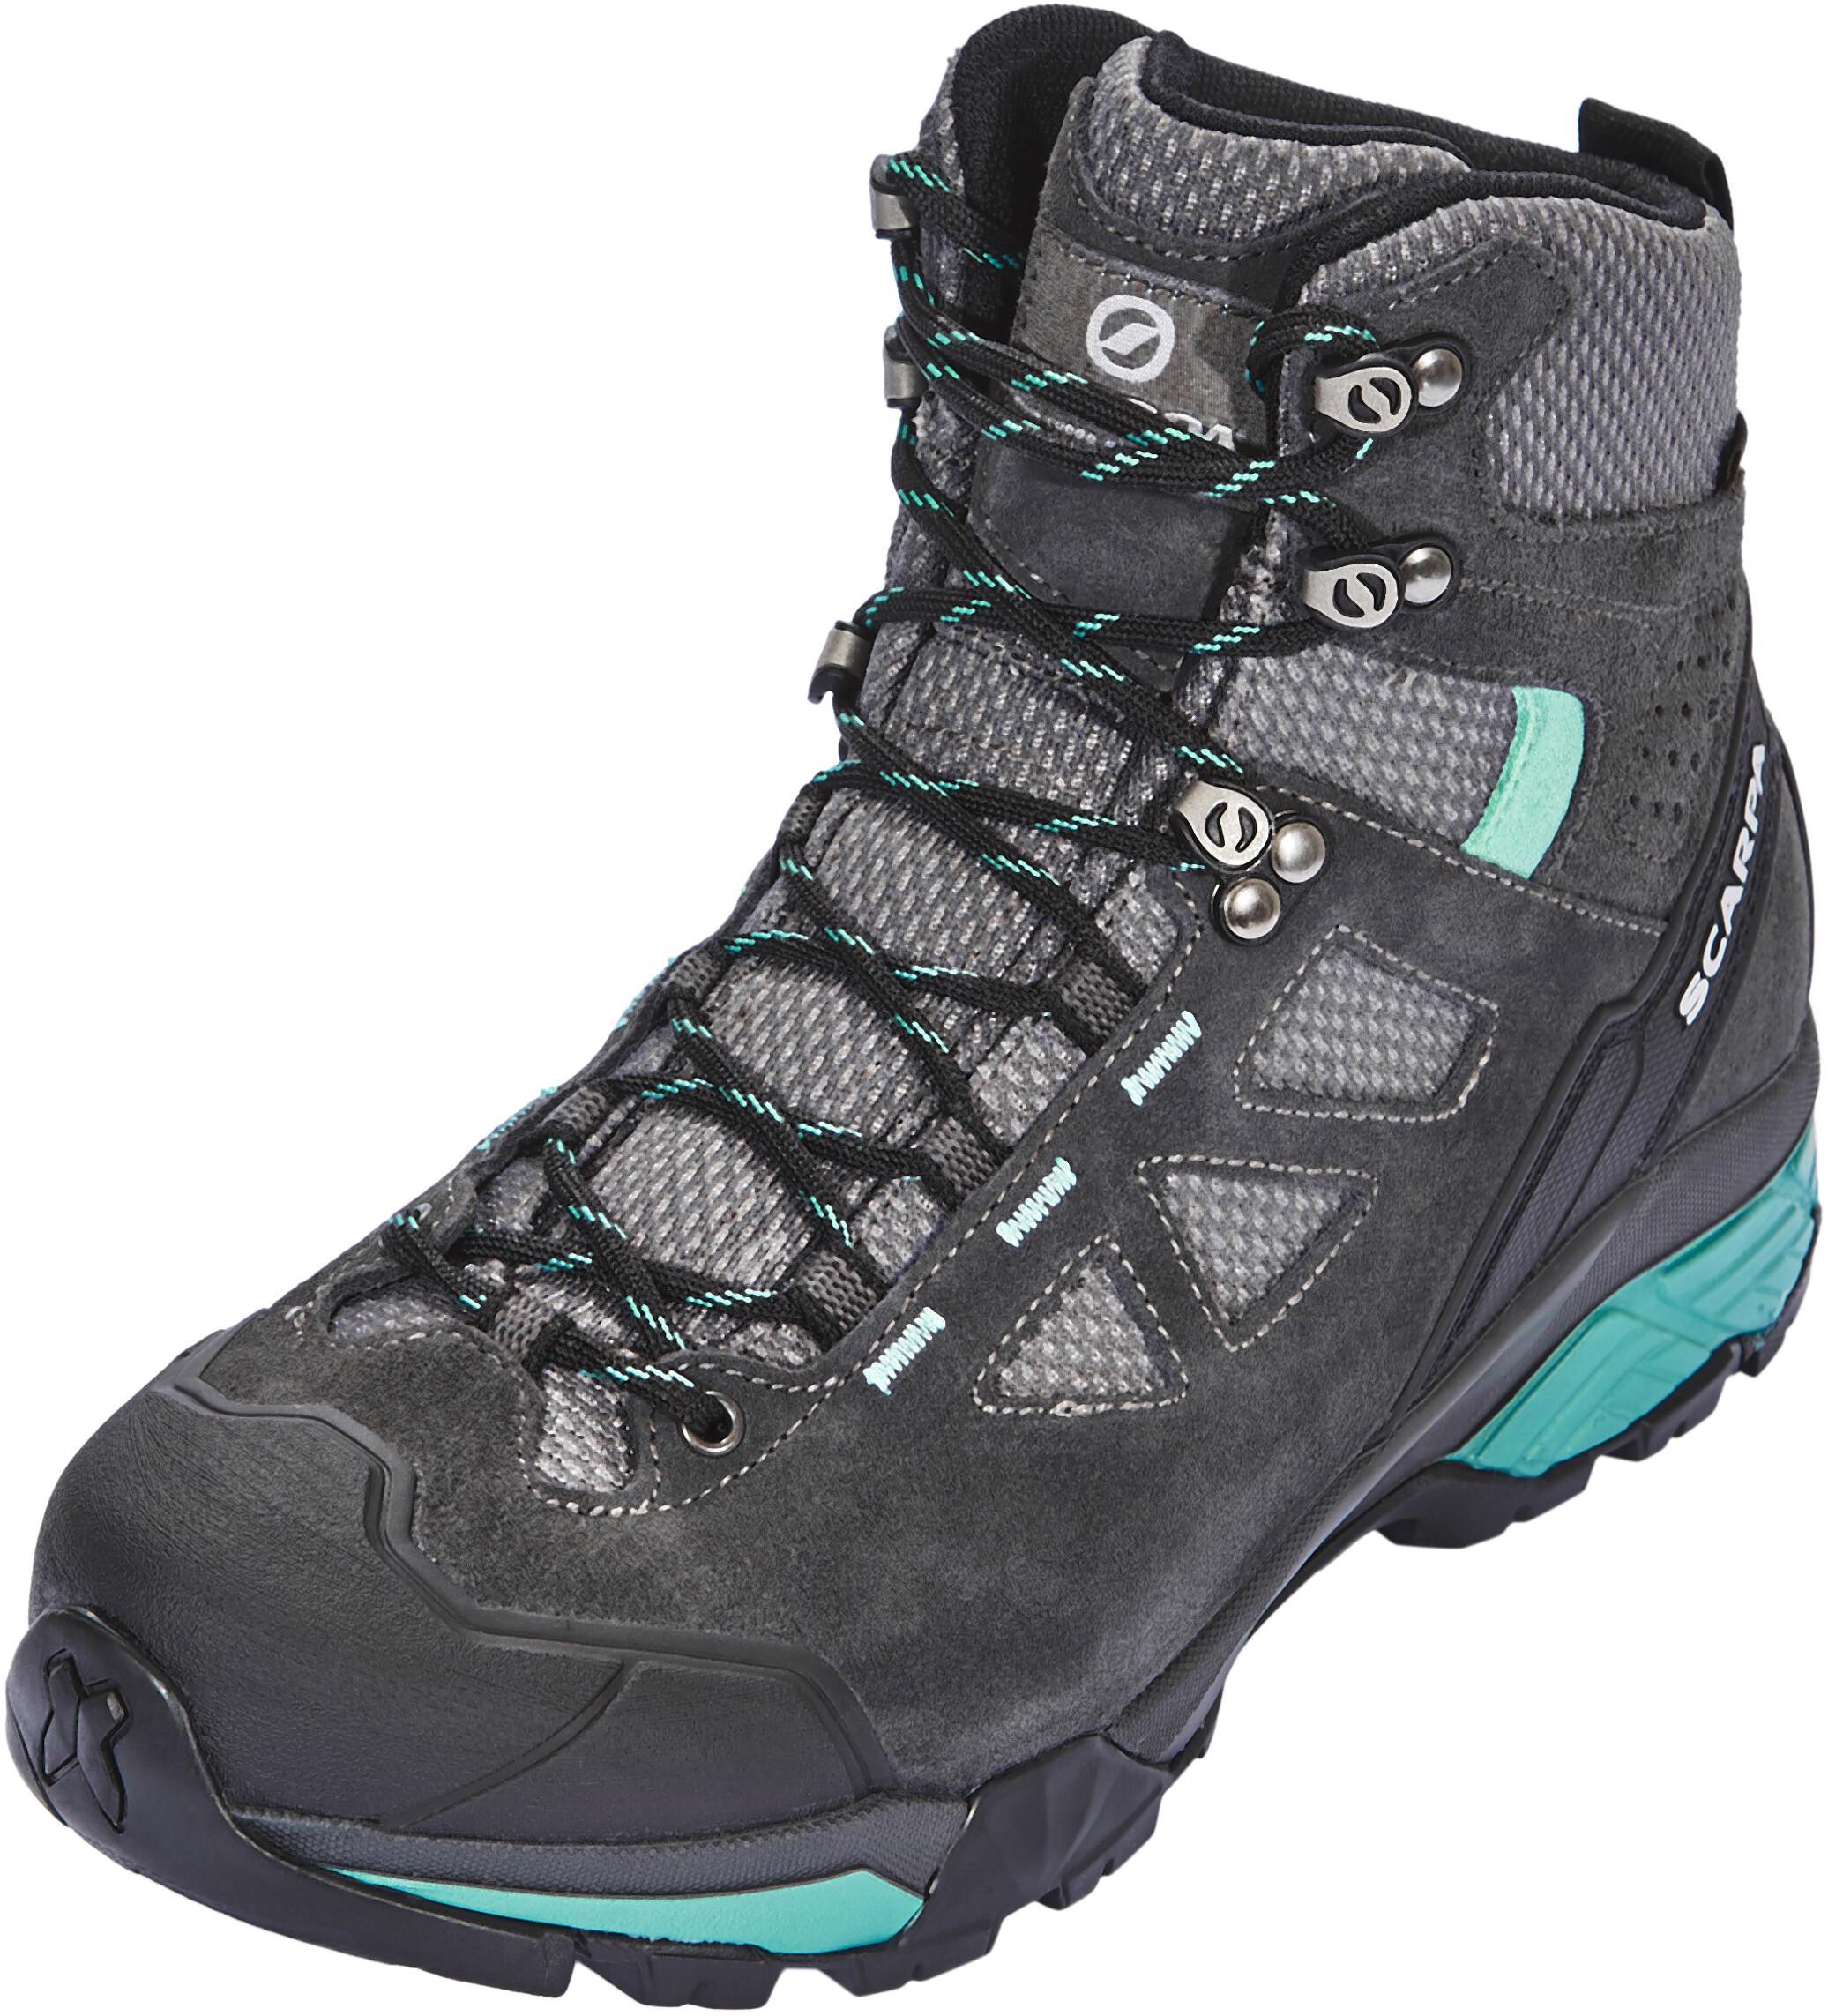 c7bd6f7dfd6 Scarpa ZG Lite GTX Shoes Women grey at Addnature.co.uk